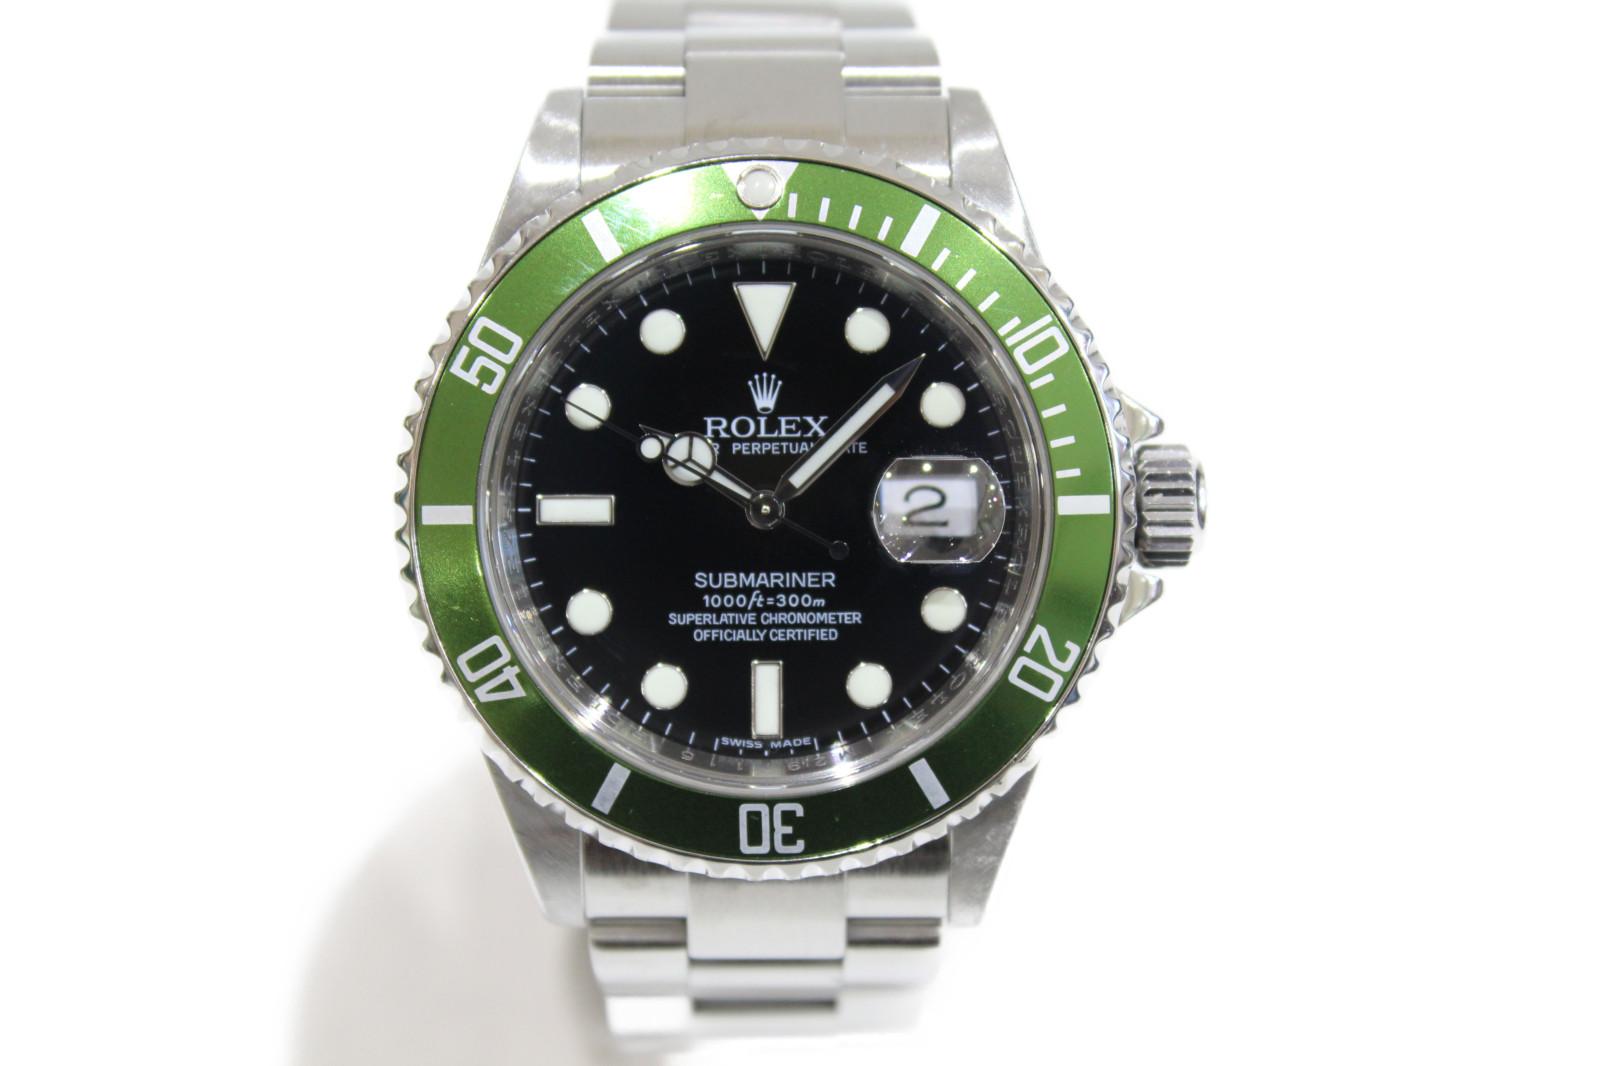 【OH済み】ROLEX ロレックス サブマリーナーデイト 16610LV M番 自動巻き デイト 300M防水 SS ステンレススチール グリーンサブ  緑サブ グリーン ブラック メンズ 腕時計【中古】